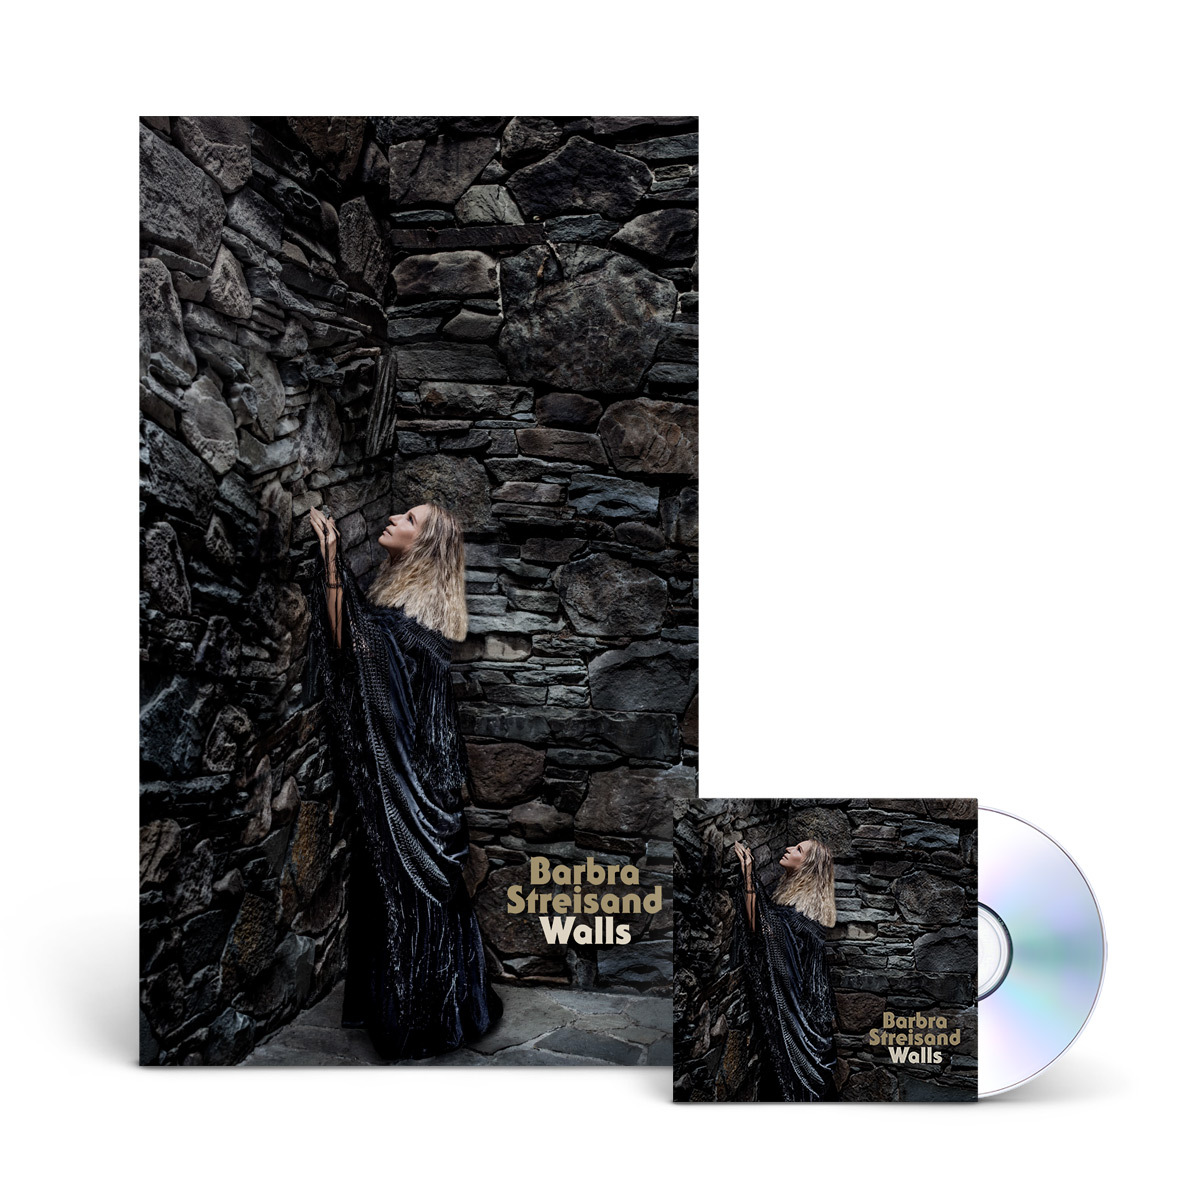 Walls CD + Lithograph